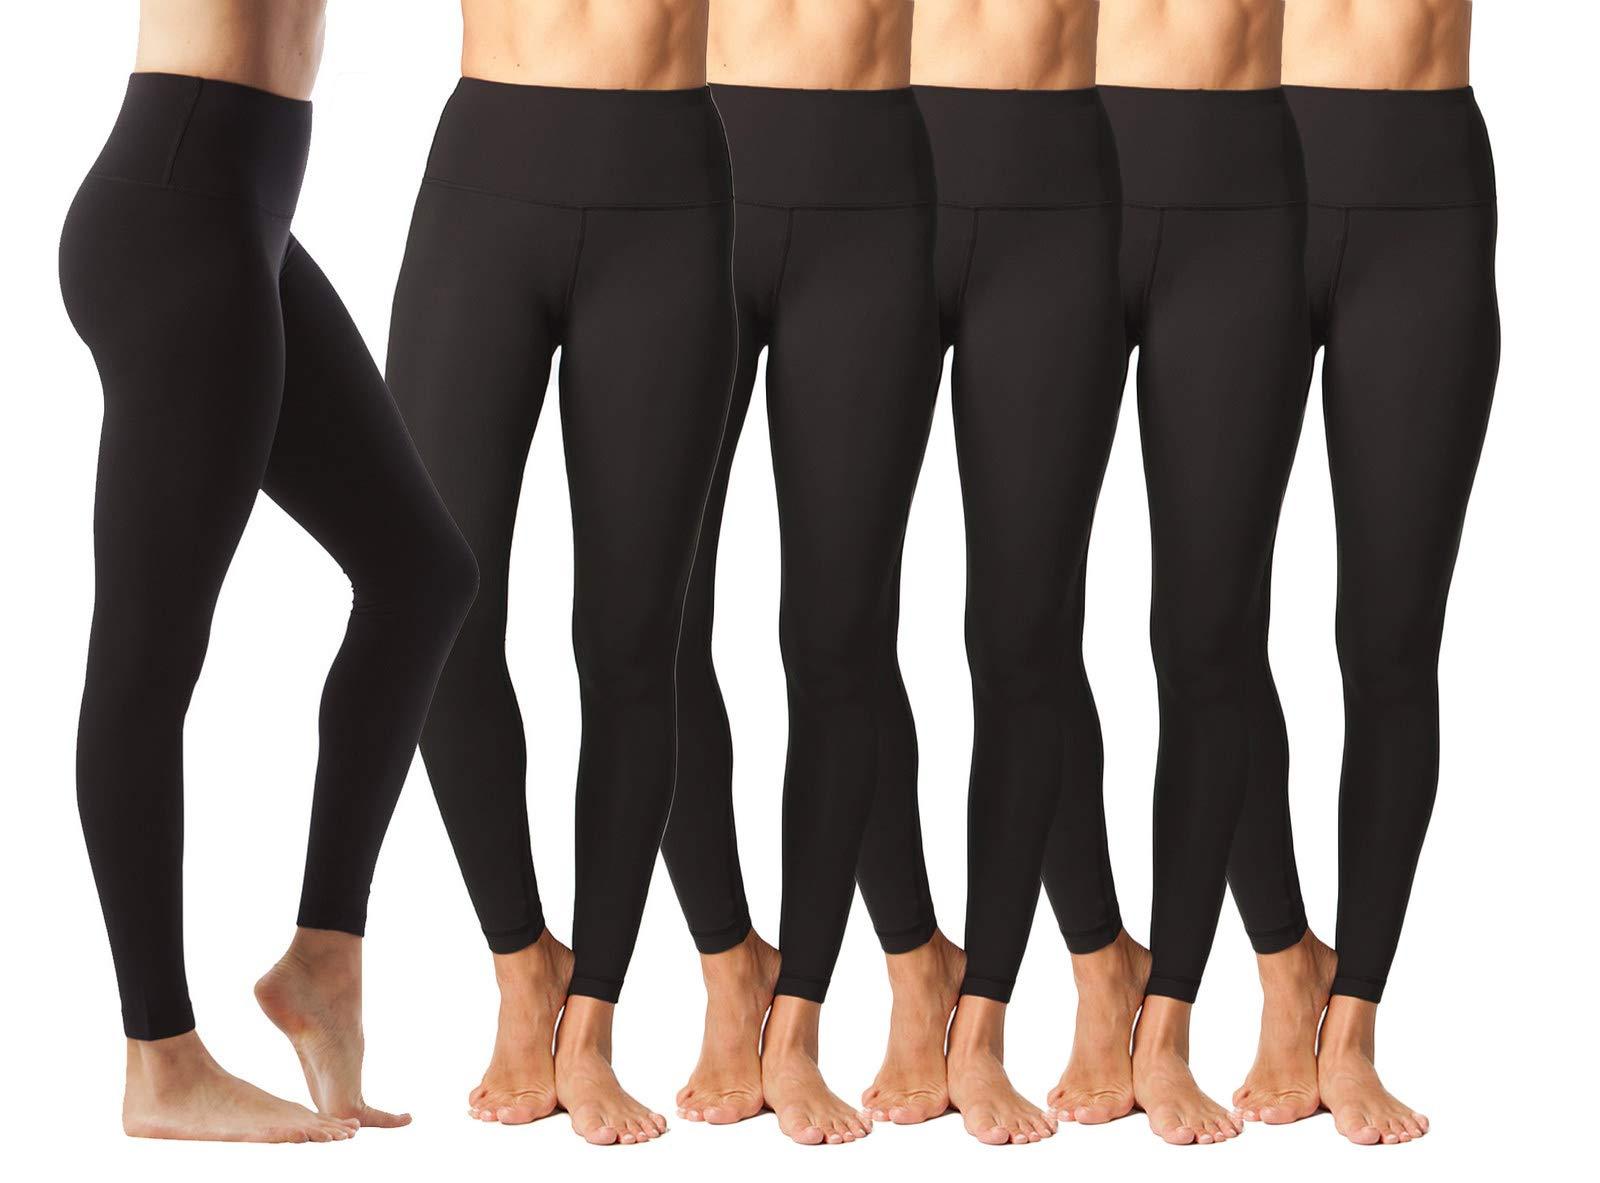 90 Degree By Reflex - High Waist Power Flex Legging – Tummy Control - Black 6 Pack - Large